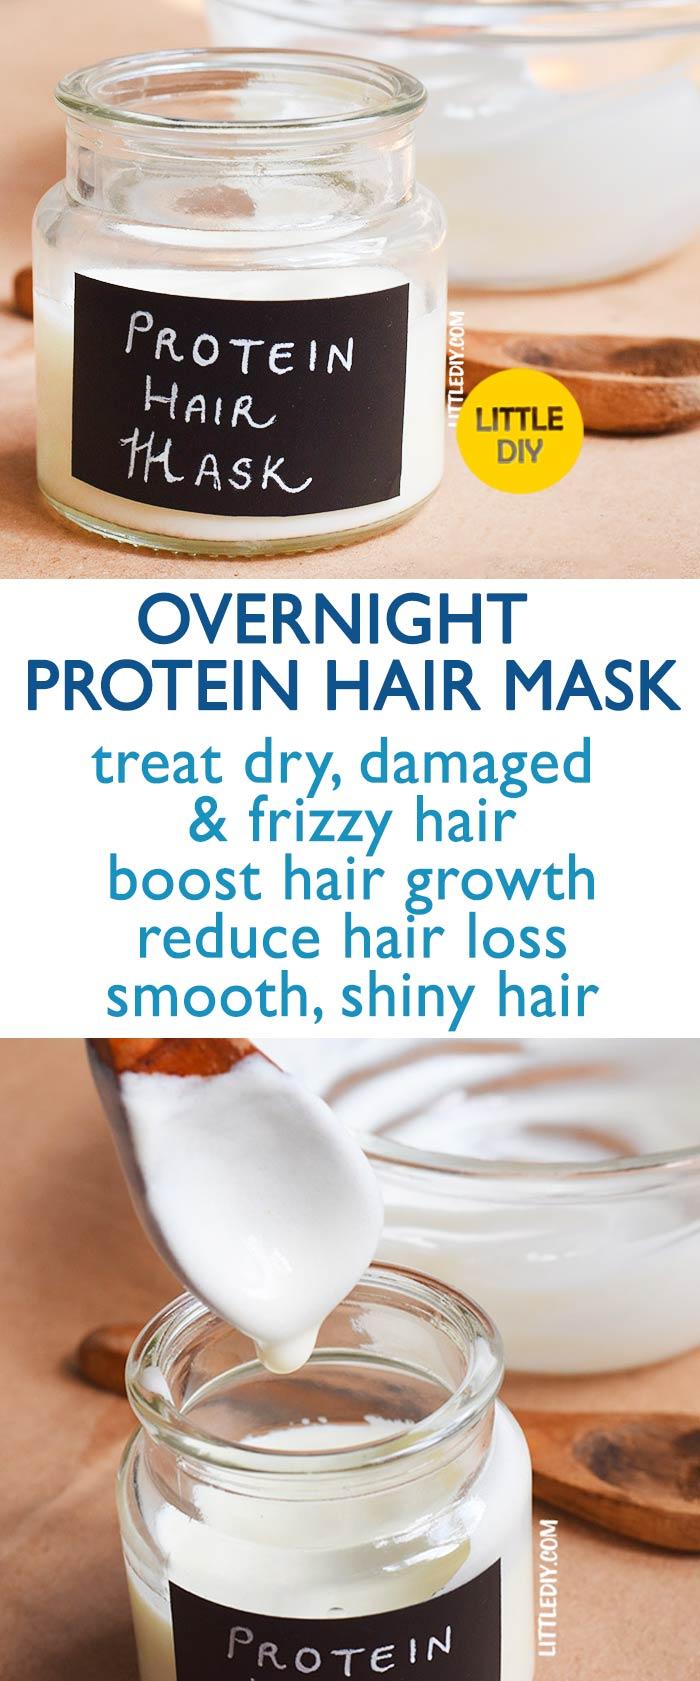 OVERNIGHT COCONUT MILK PROTEIN HAIR MASK